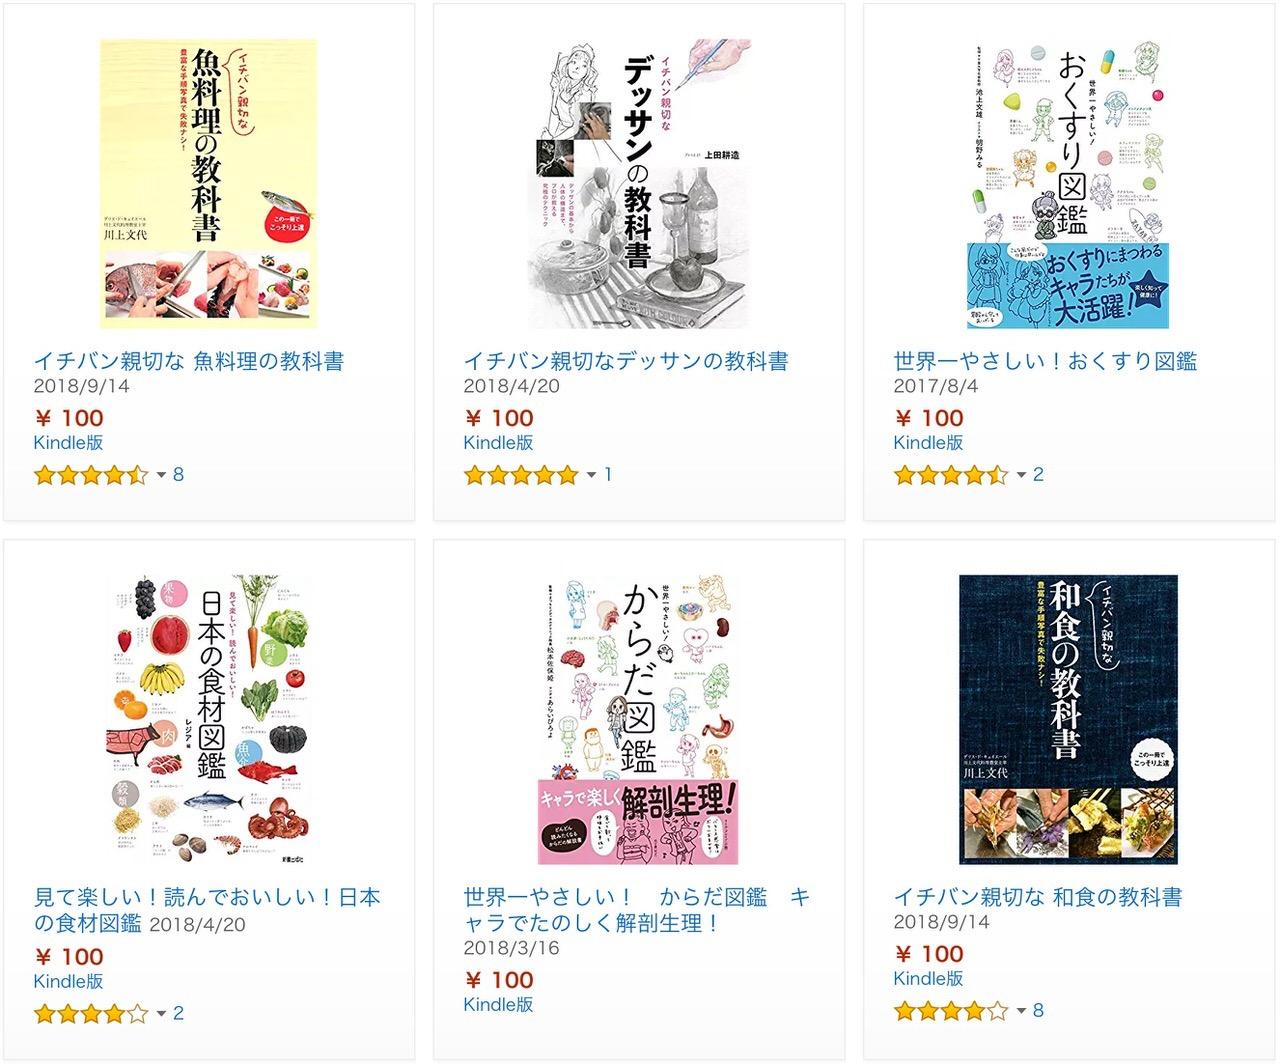 【Kindleセール】 58%オフ以上「新星出版社人気作品キャンペーン」(12/14まで)